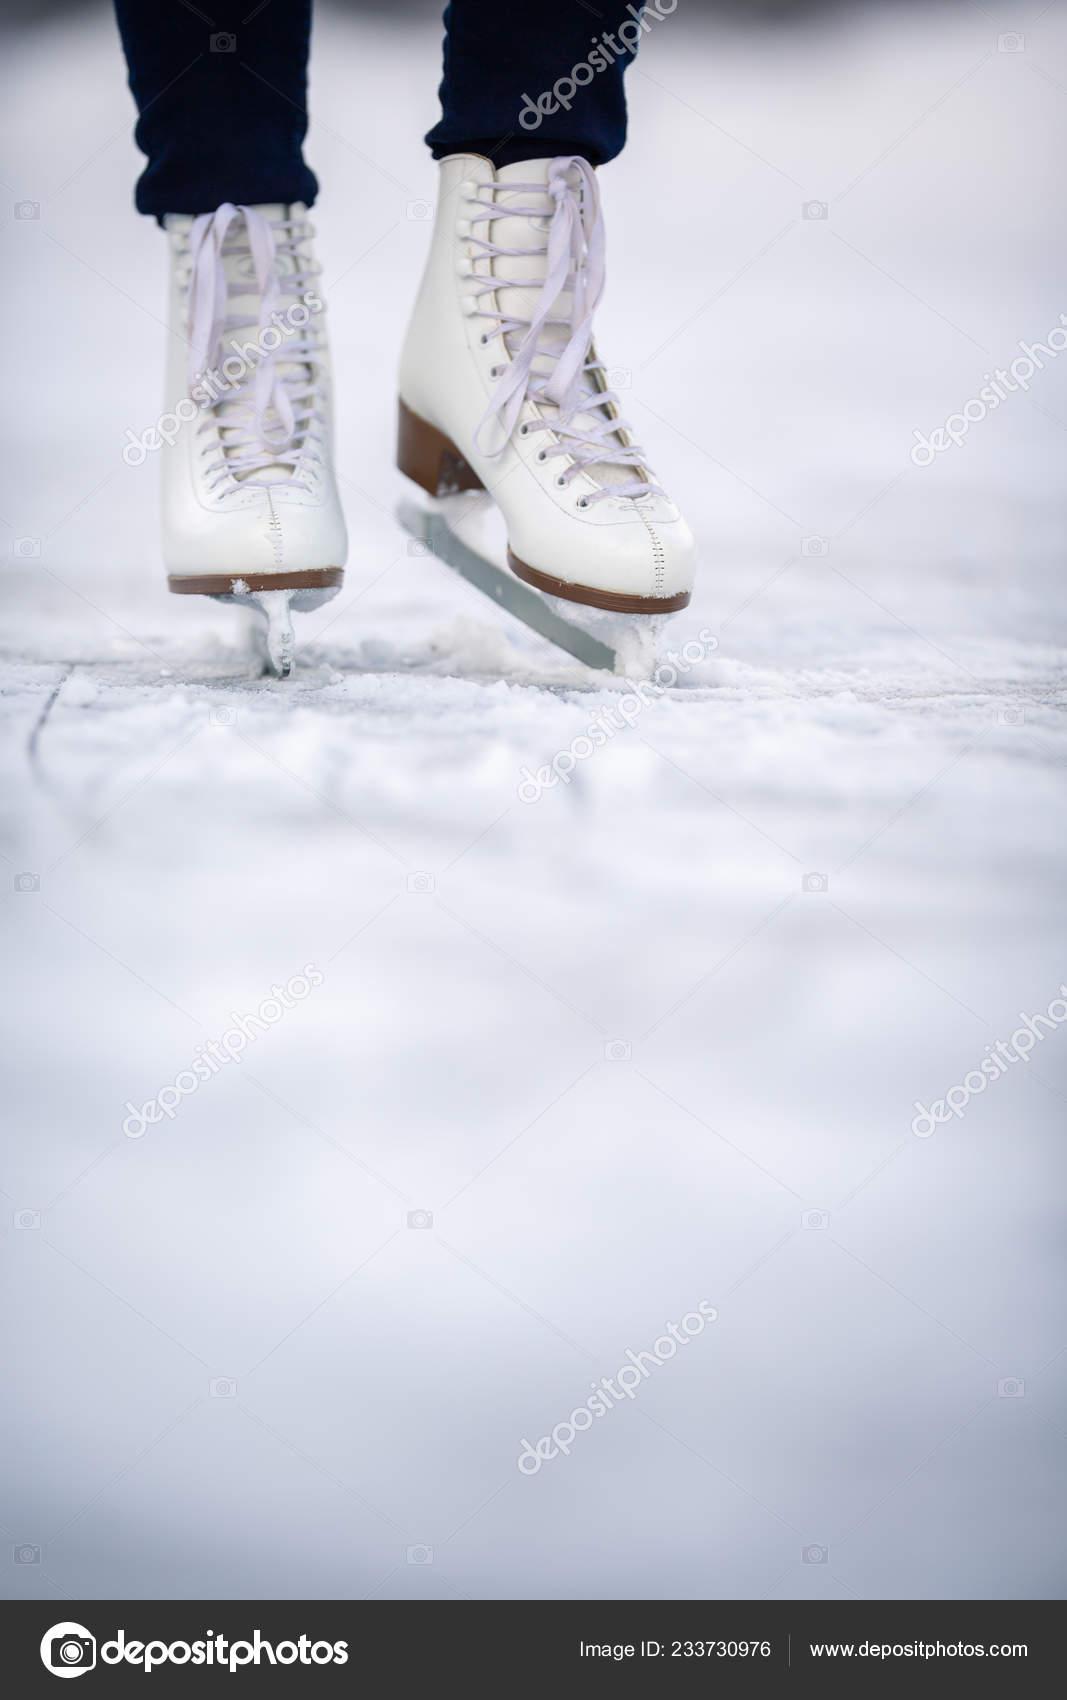 Áˆ Ice Skating Stock Images Royalty Free Ice Skates Photos Download On Depositphotos